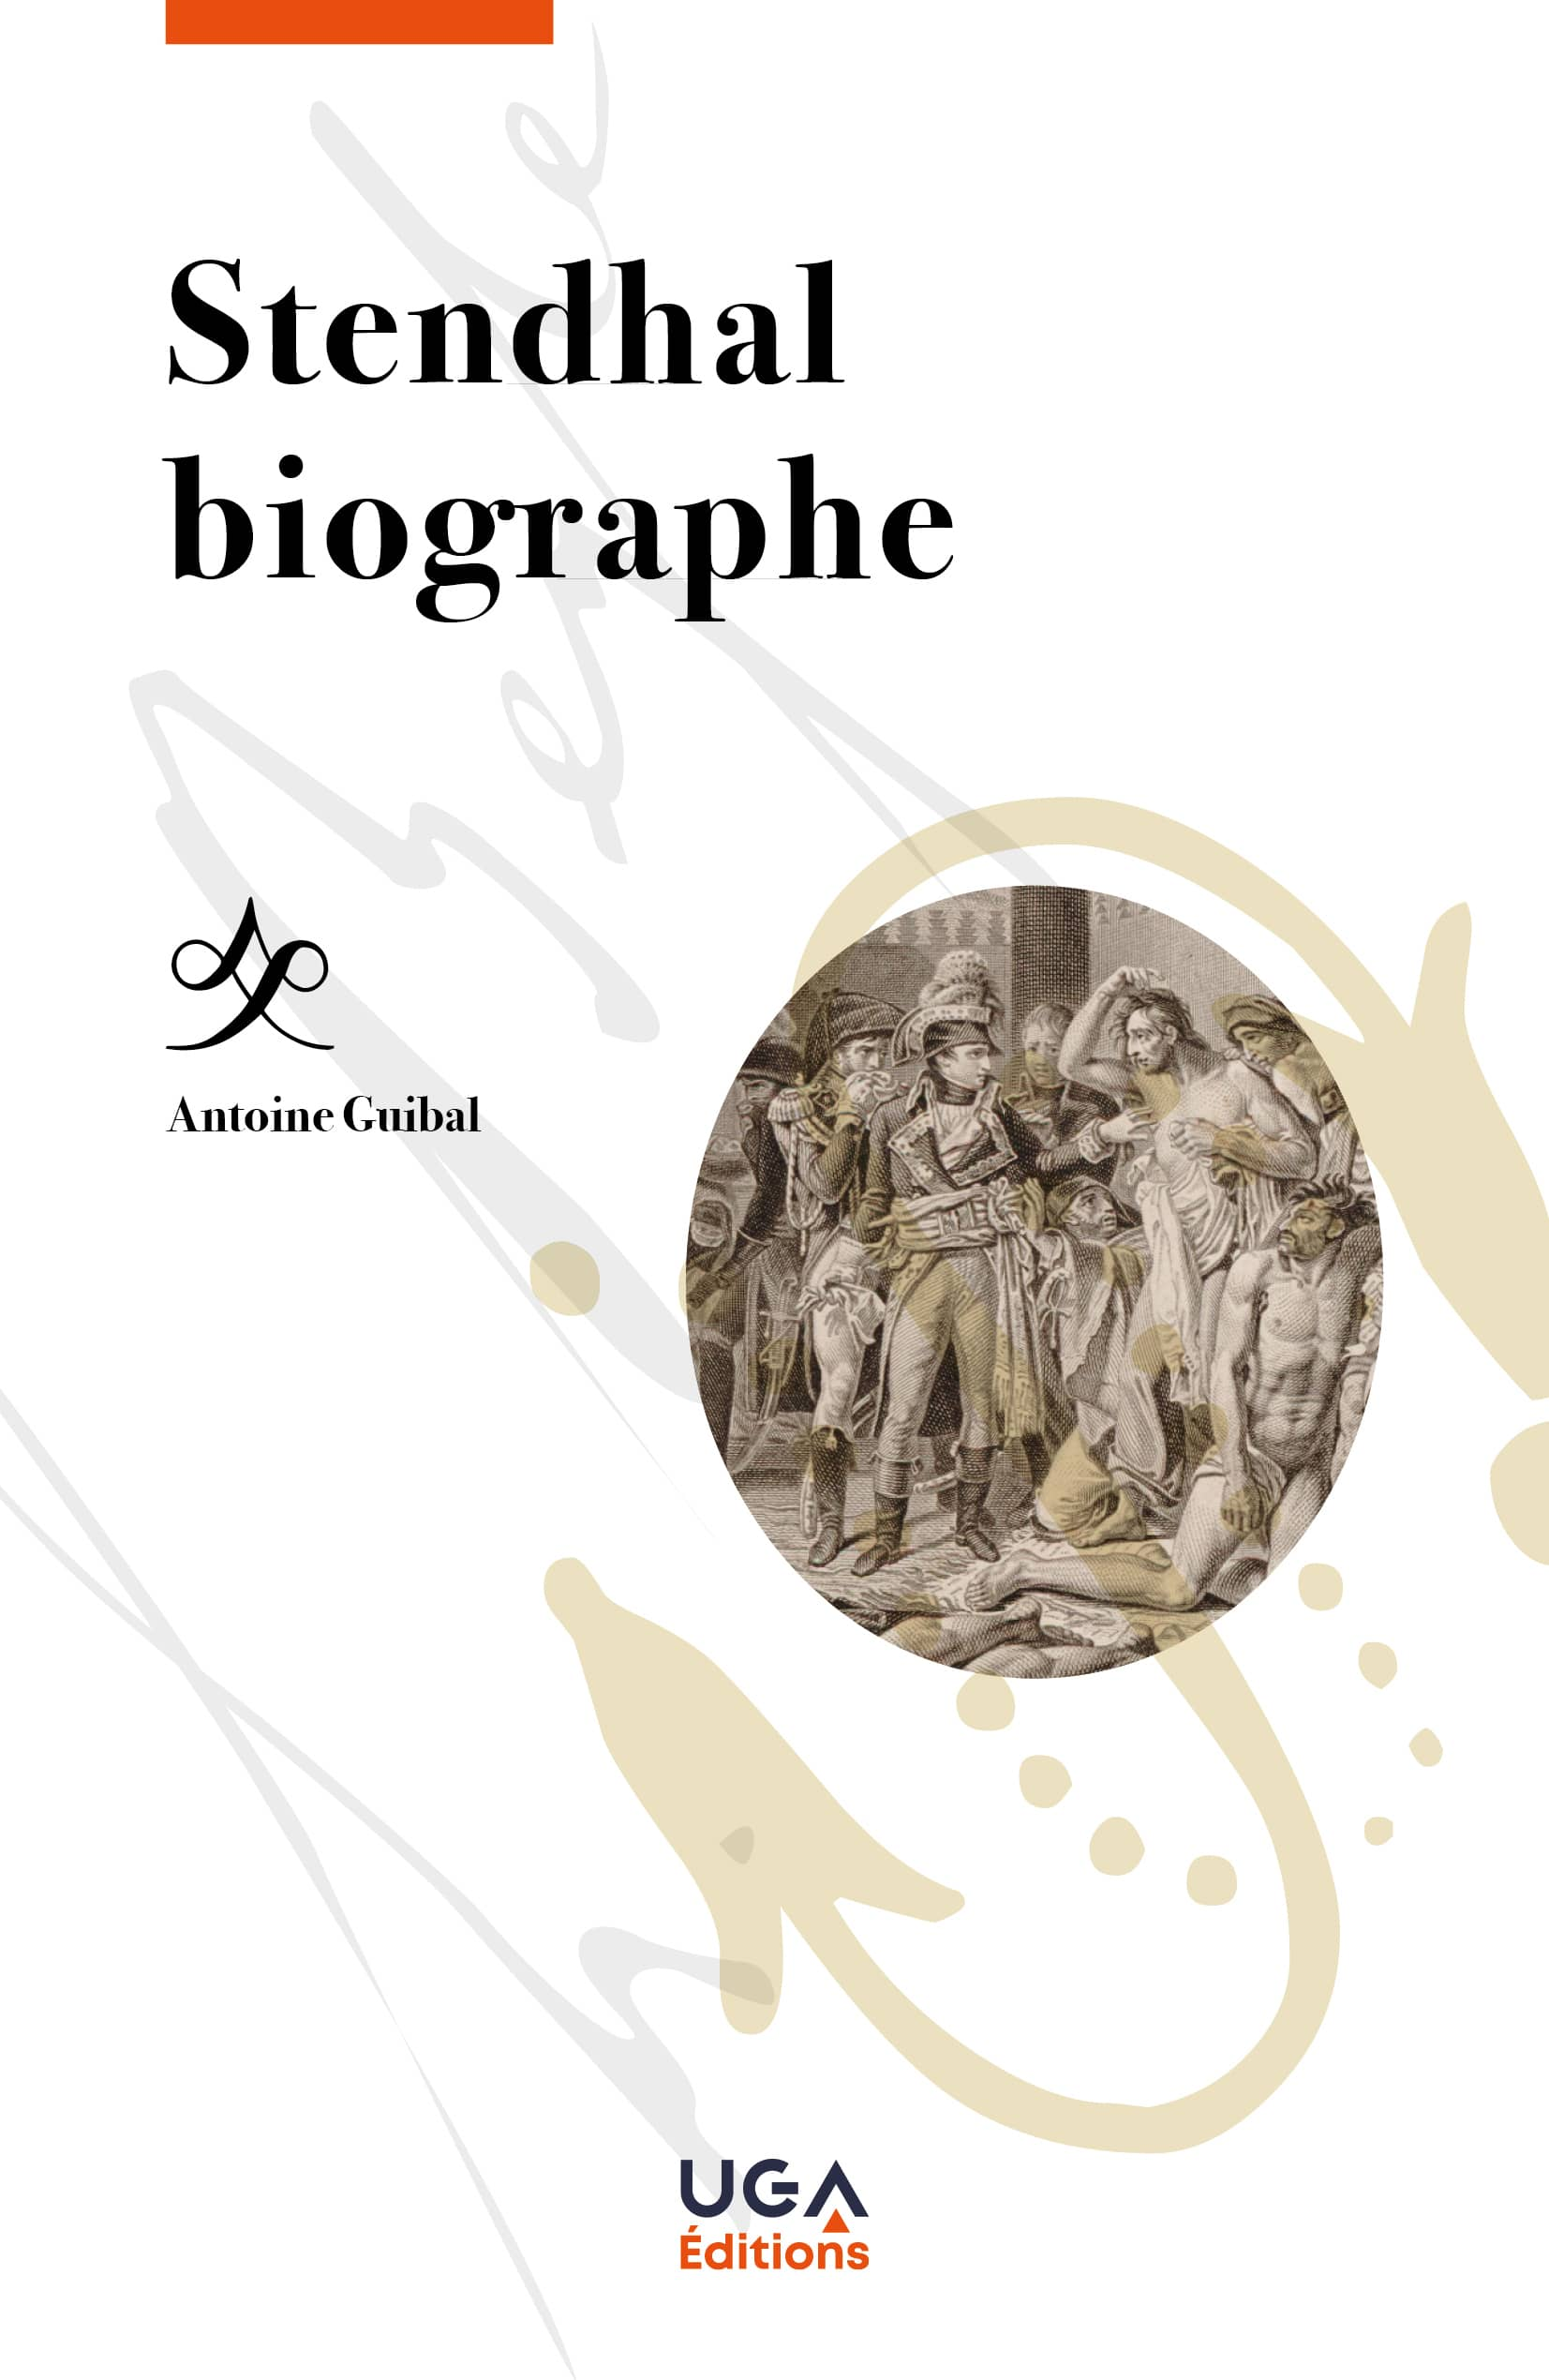 A. Guibal, Stendhal biographe